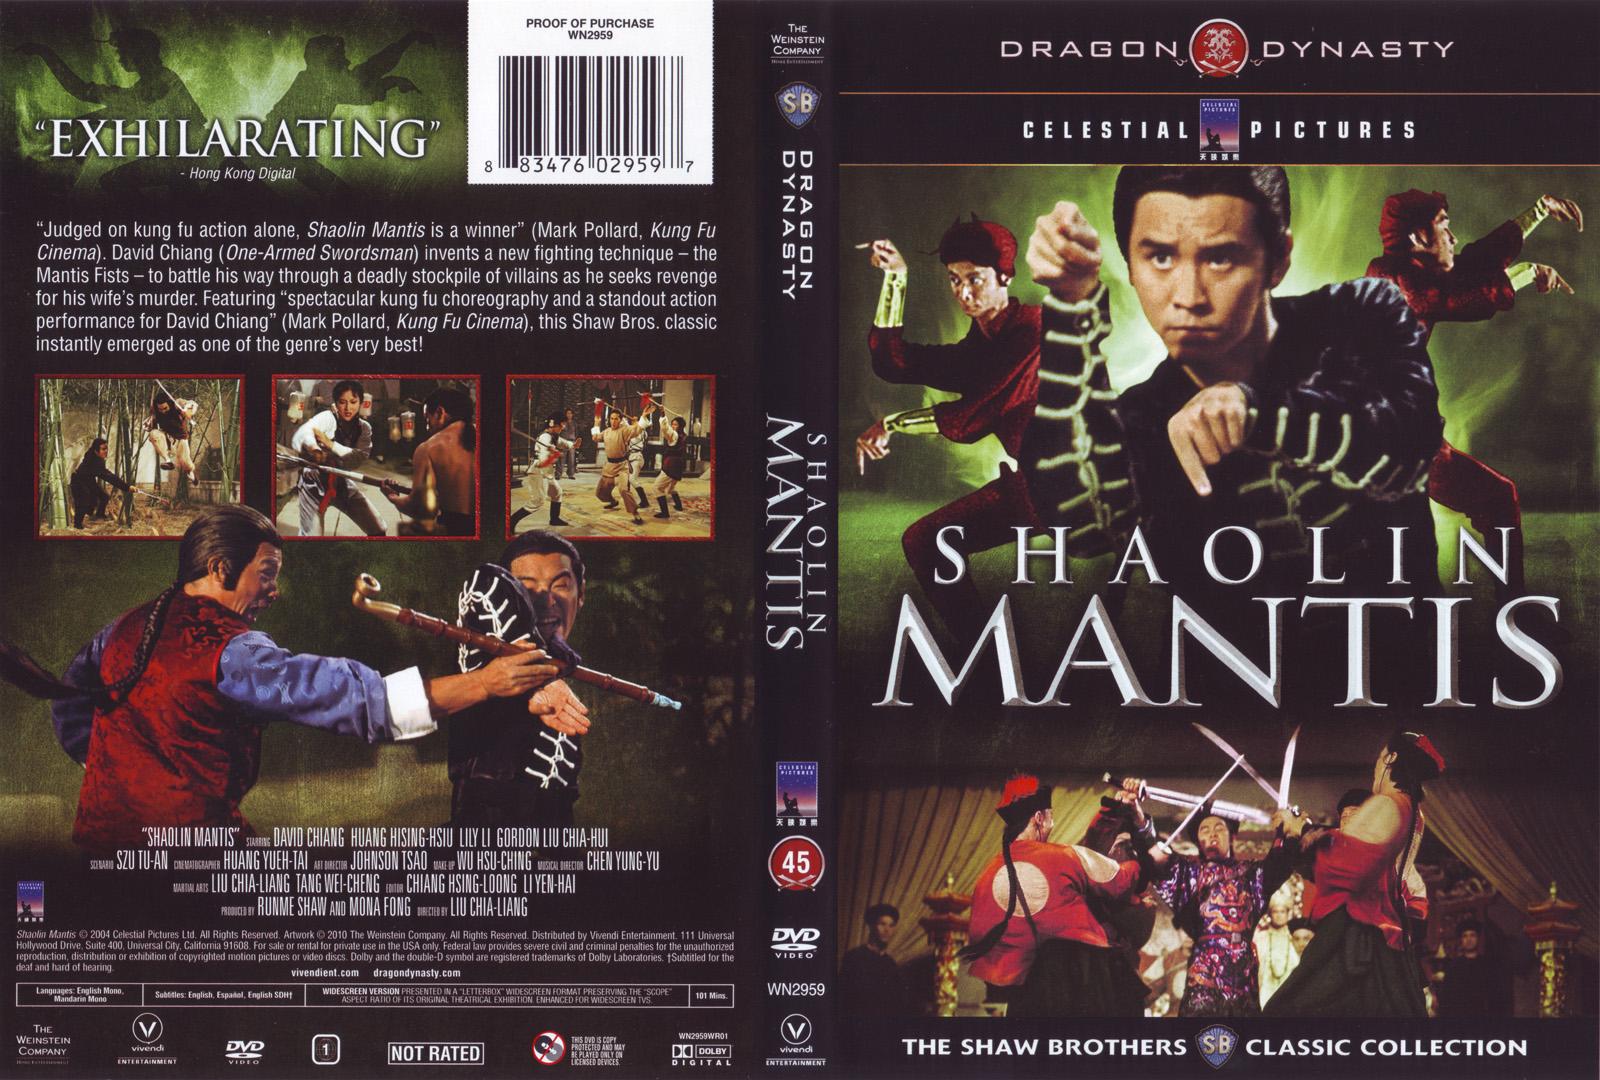 shaolin mantis 1978 full movie in mandarin with english subtitles